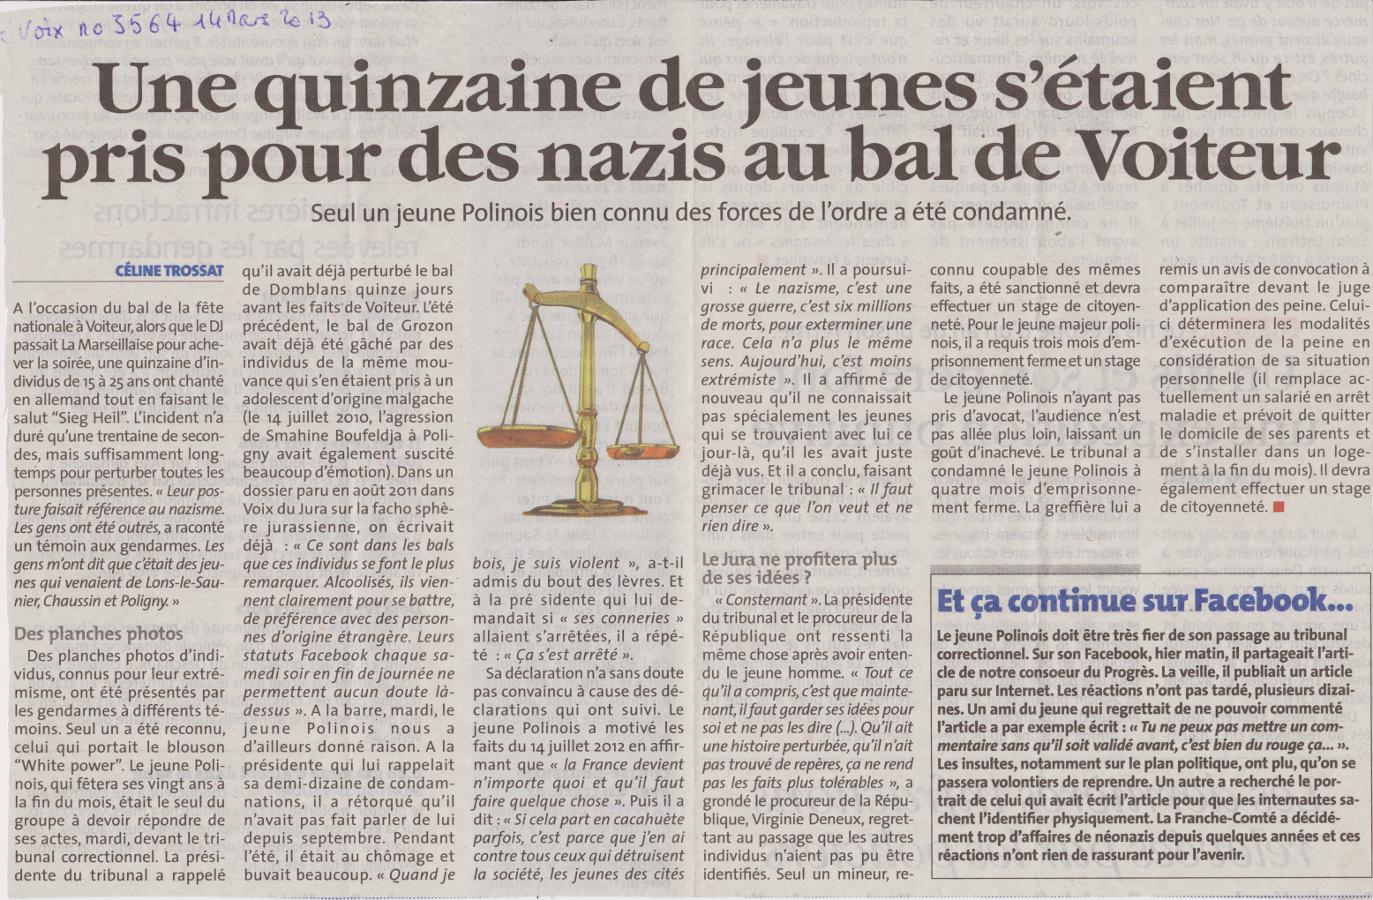 http://juralib.noblogs.org/files/2013/04/voiteur.png